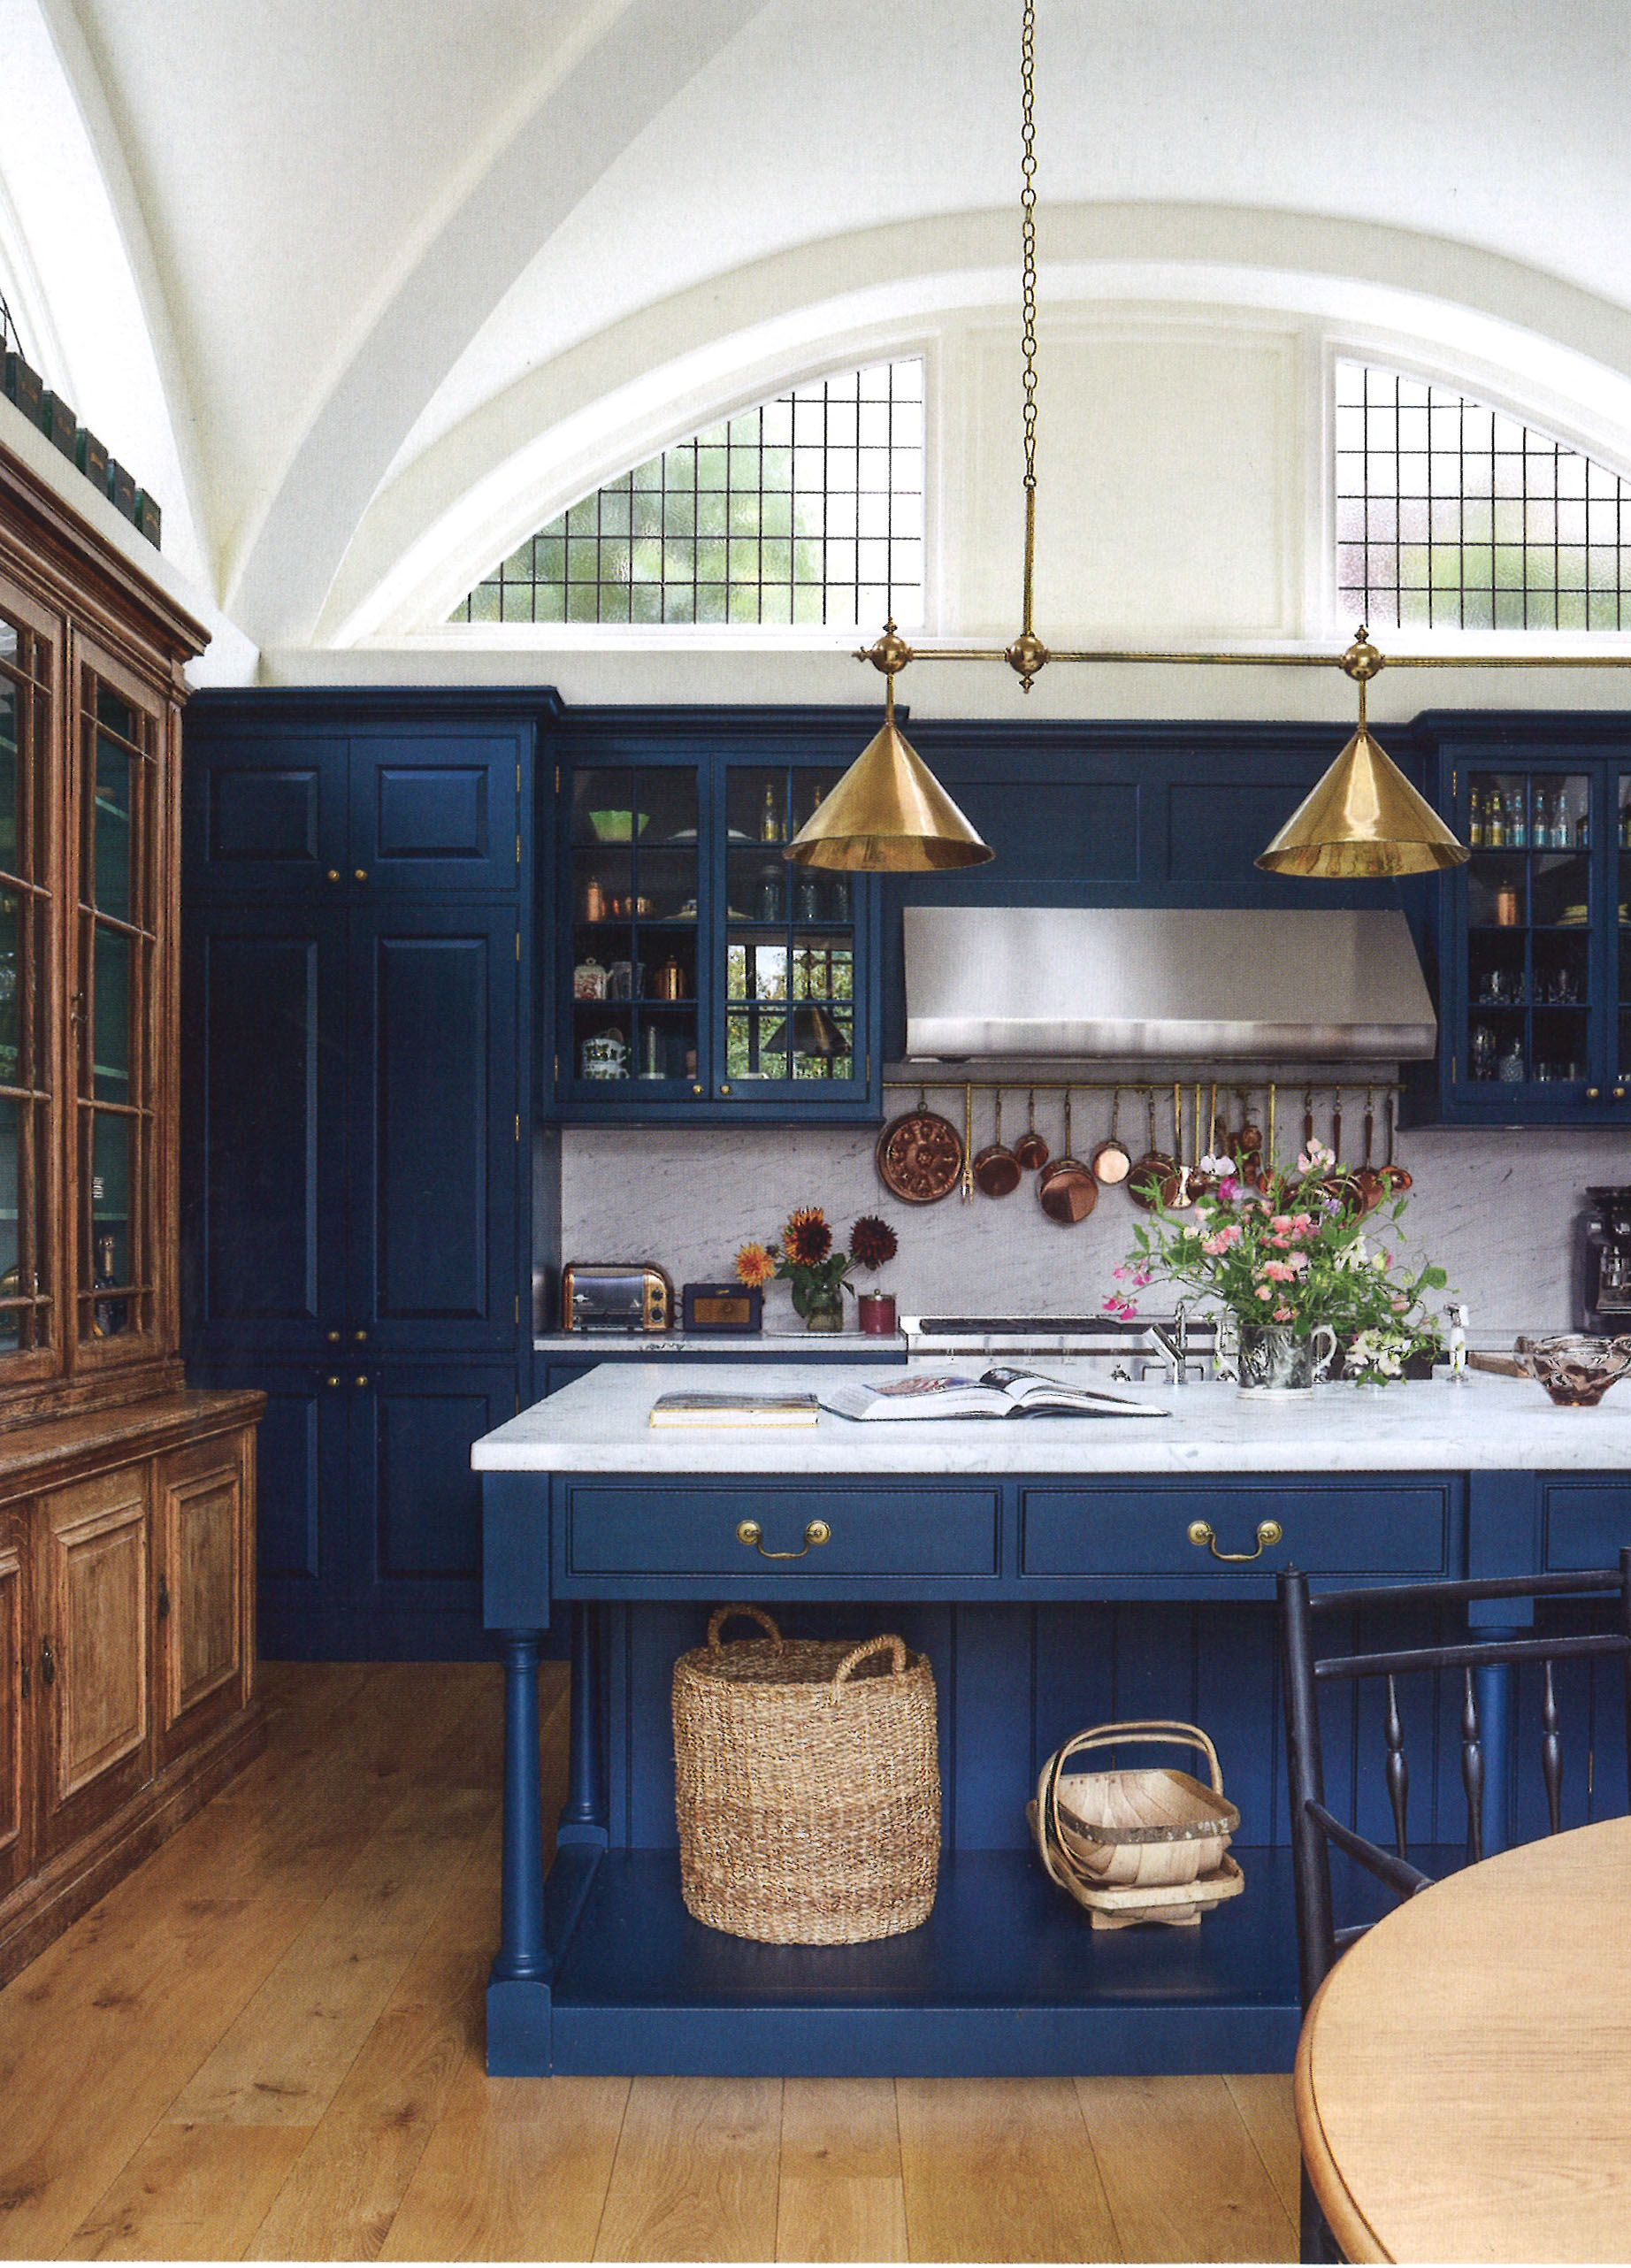 Pin By Summerour Architects On Kitchen Kitchen Window Design Interior Design Kitchen Kitchen Style